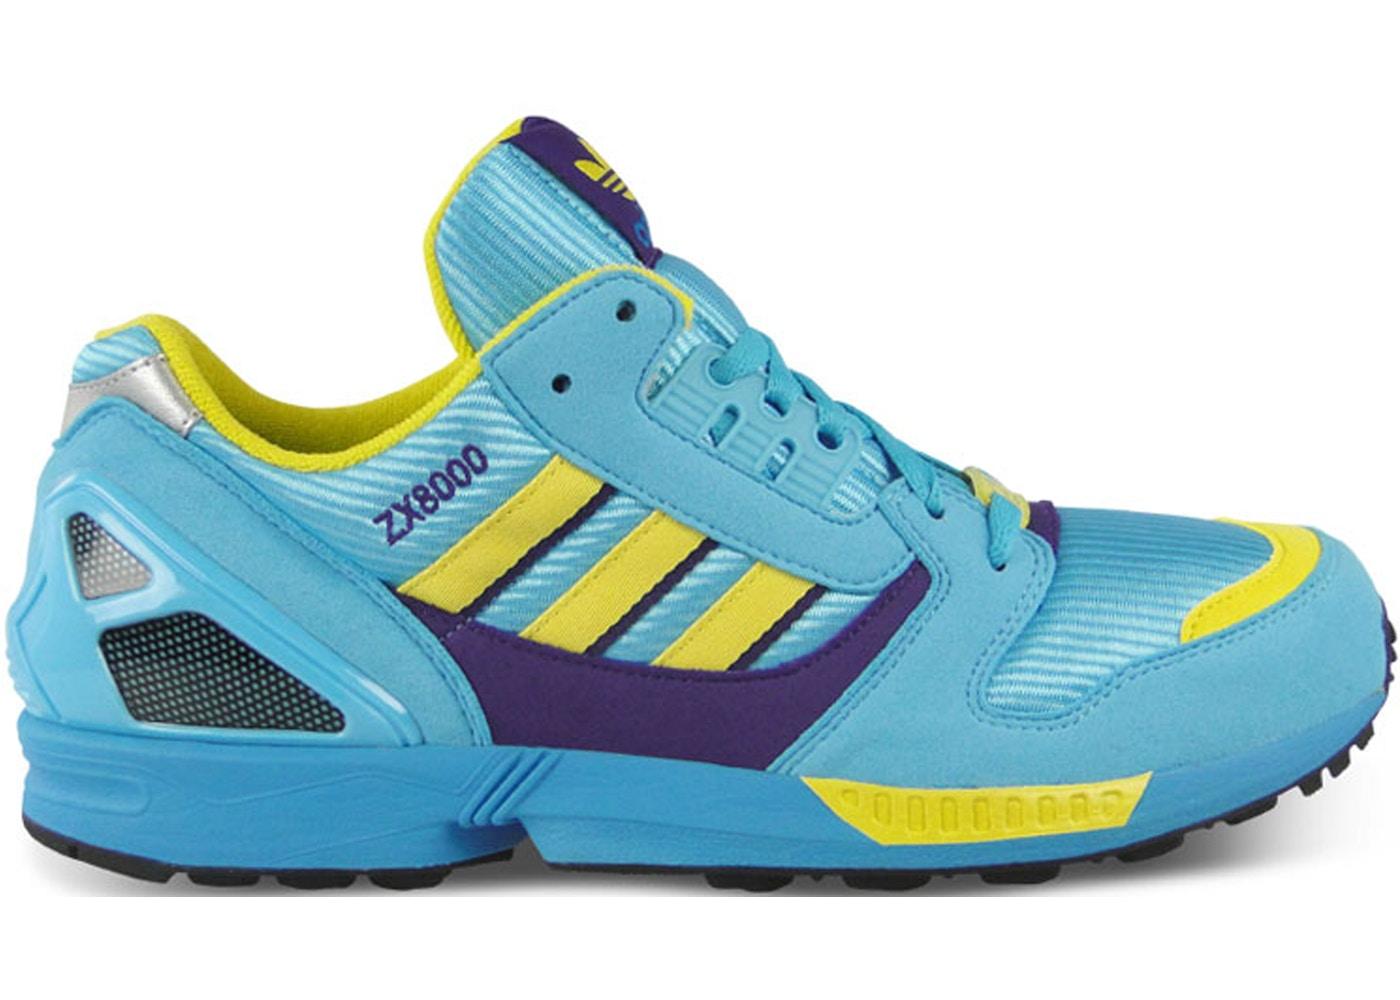 adidas ZX 8000 | Adidas zx 8000, Adidas torsion